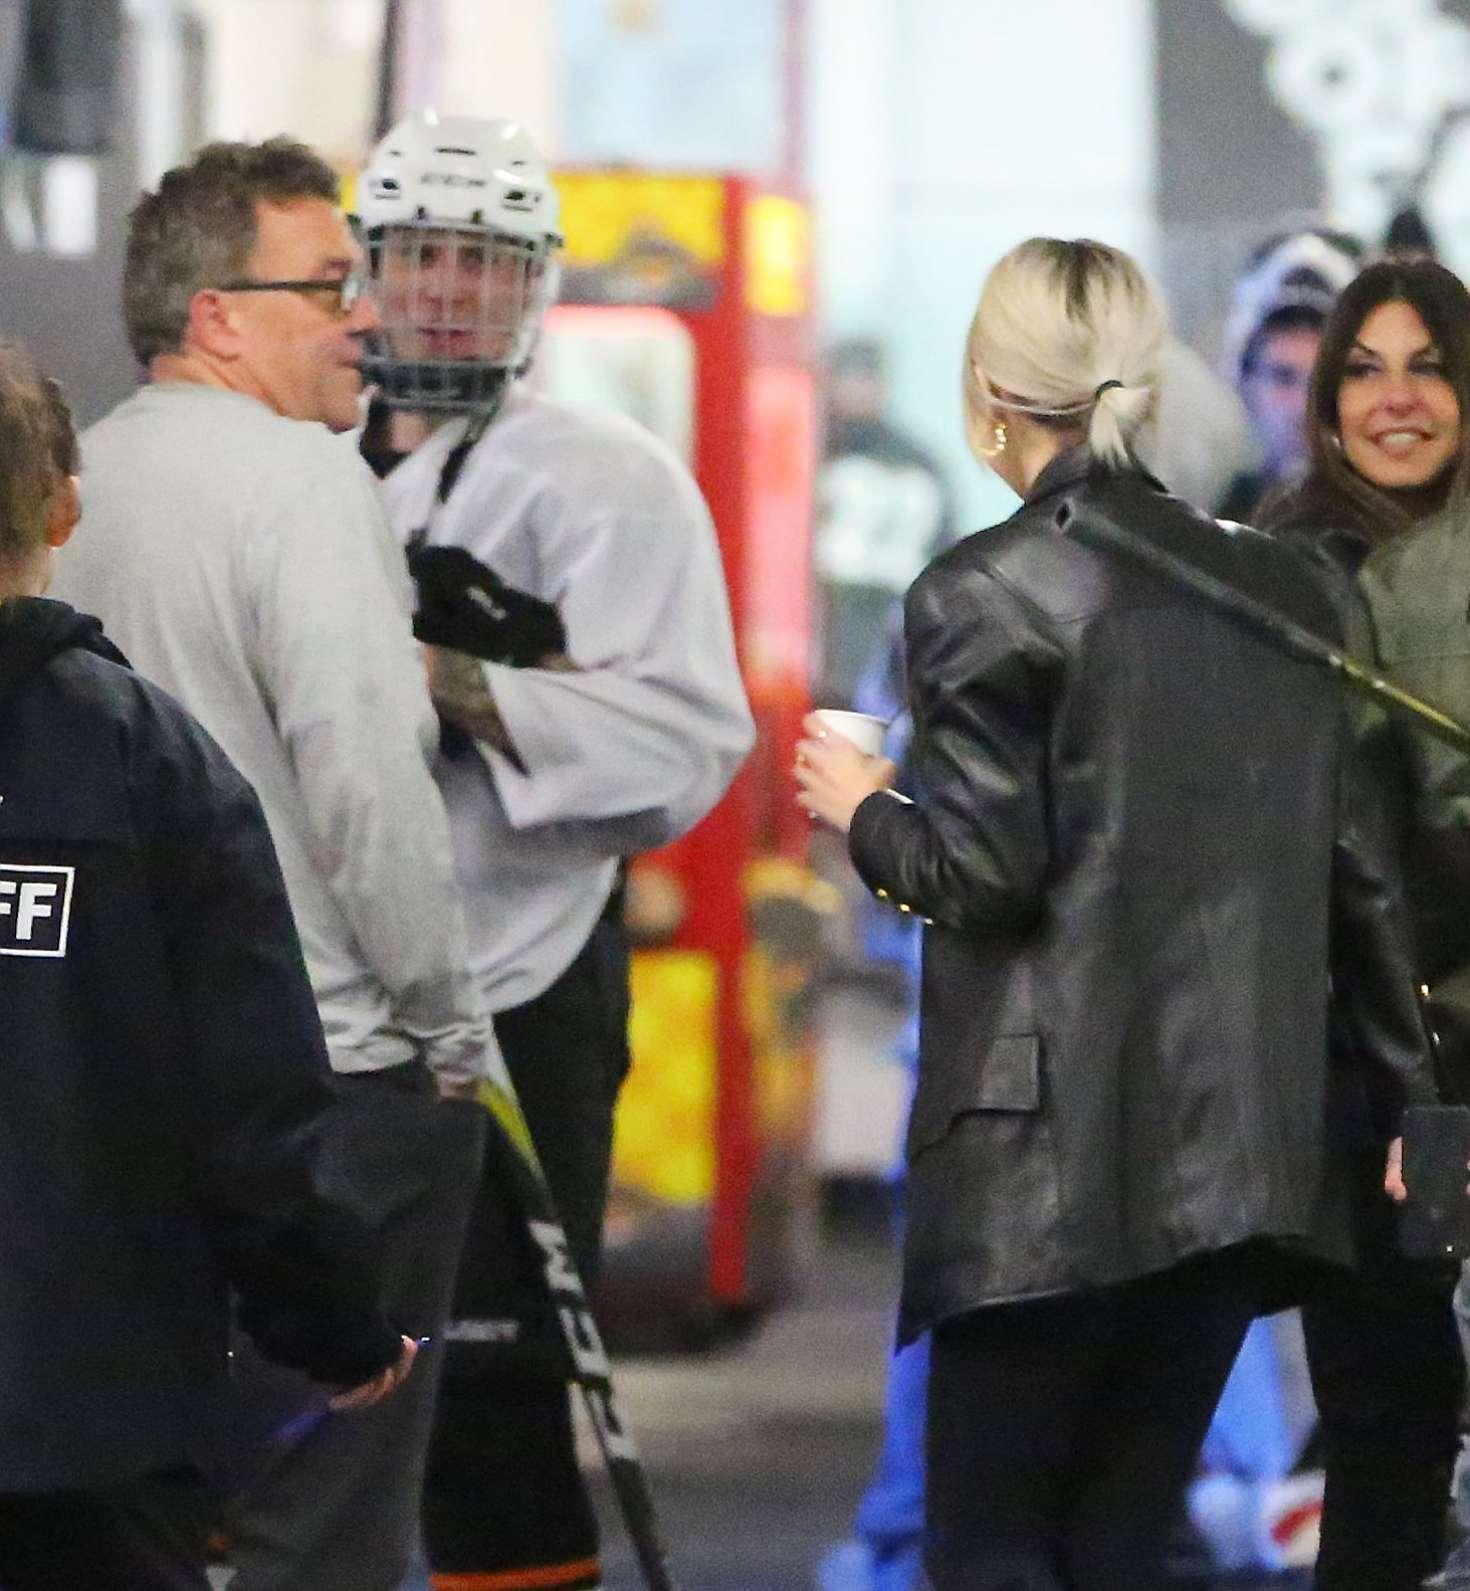 Selena Gomez 2017 : Selena Gomez: Supports Justin Bieber at his hockey game -08